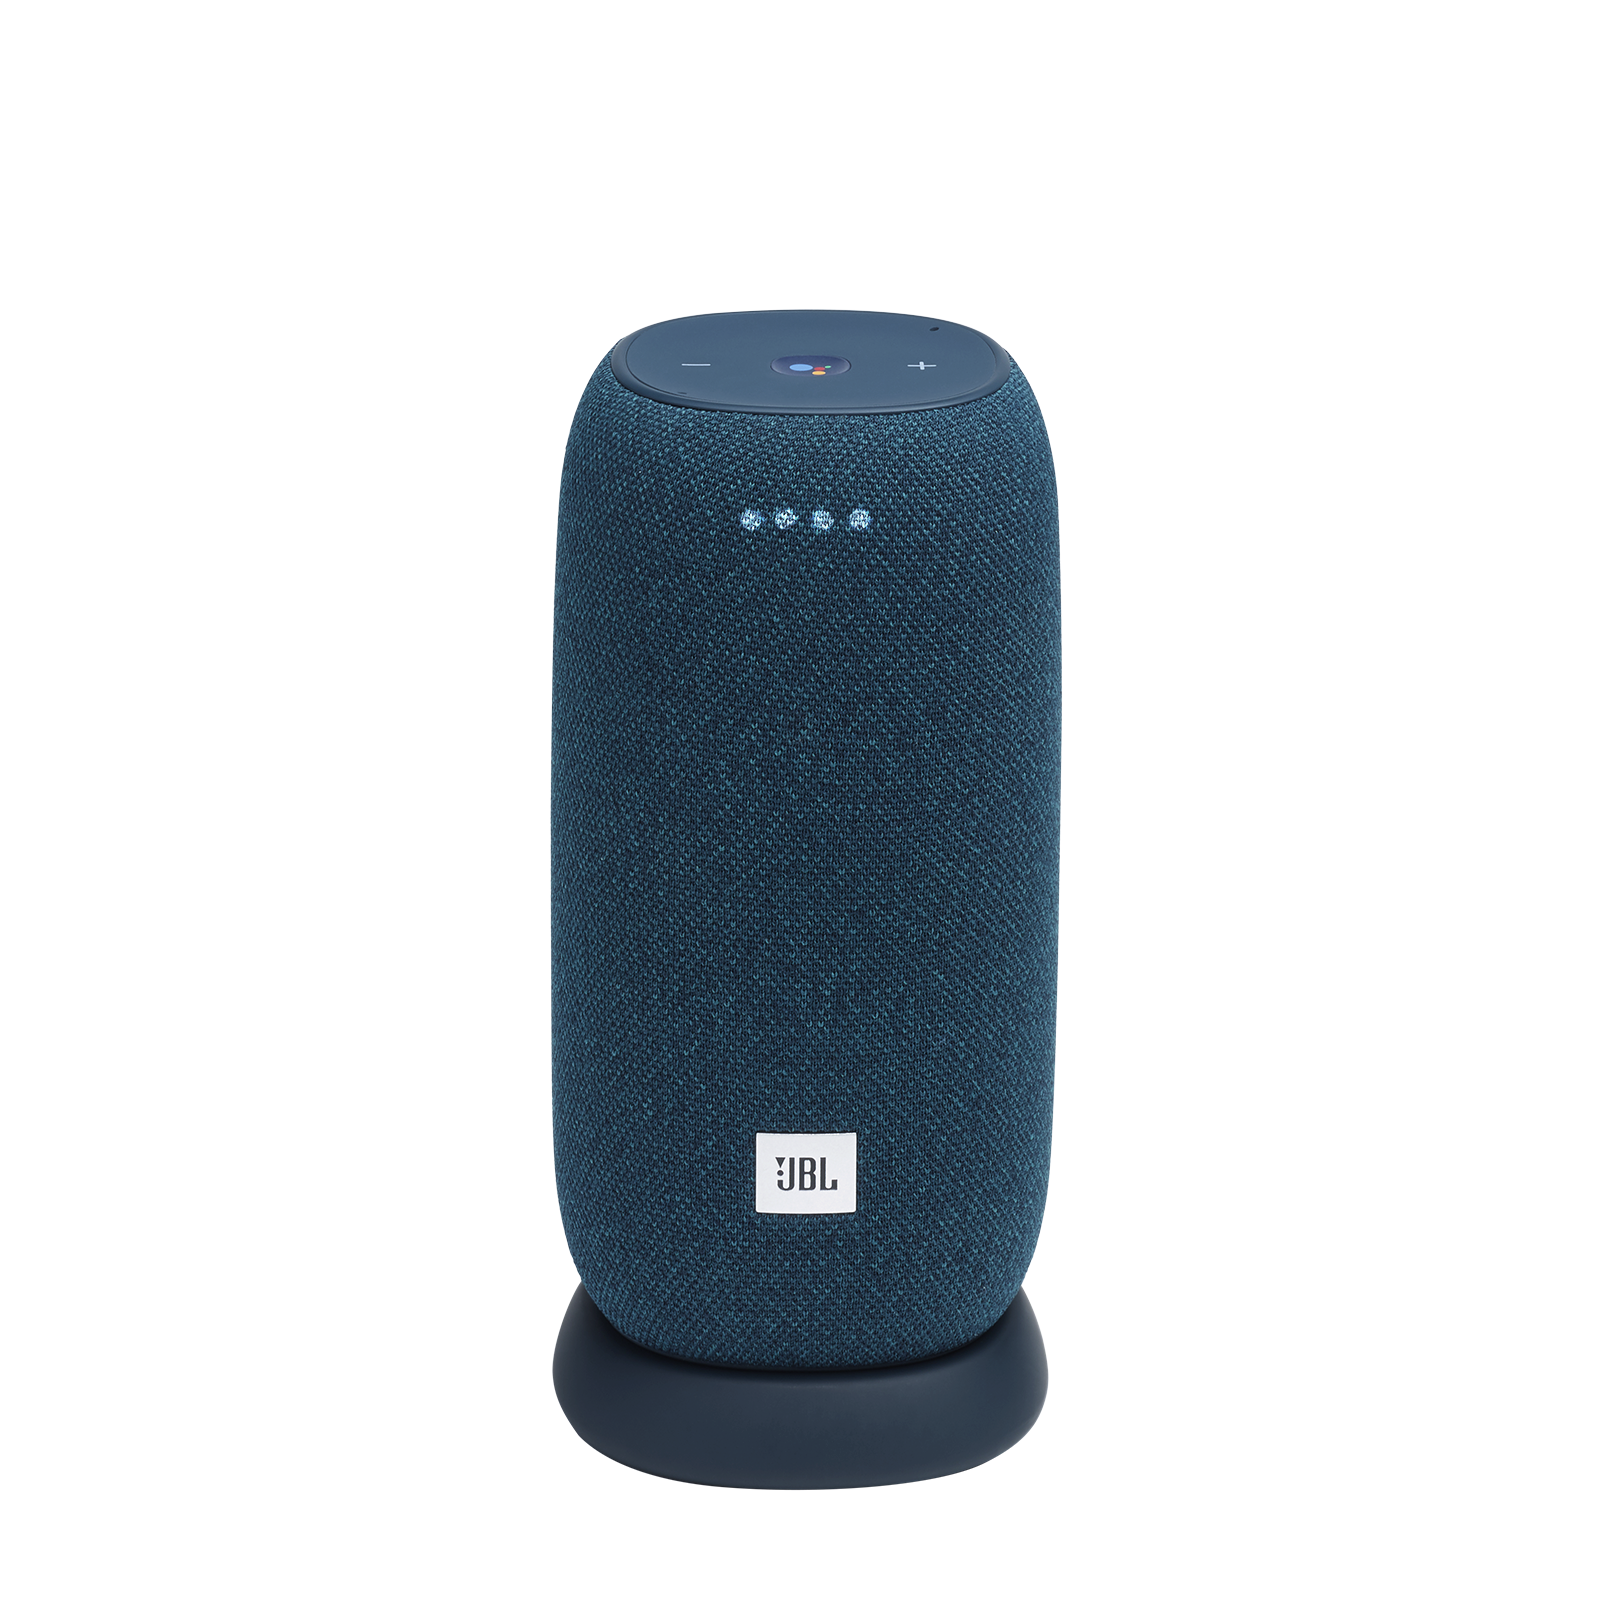 JBL Link Portable - Blue - Portable Wi-Fi Speaker - Hero